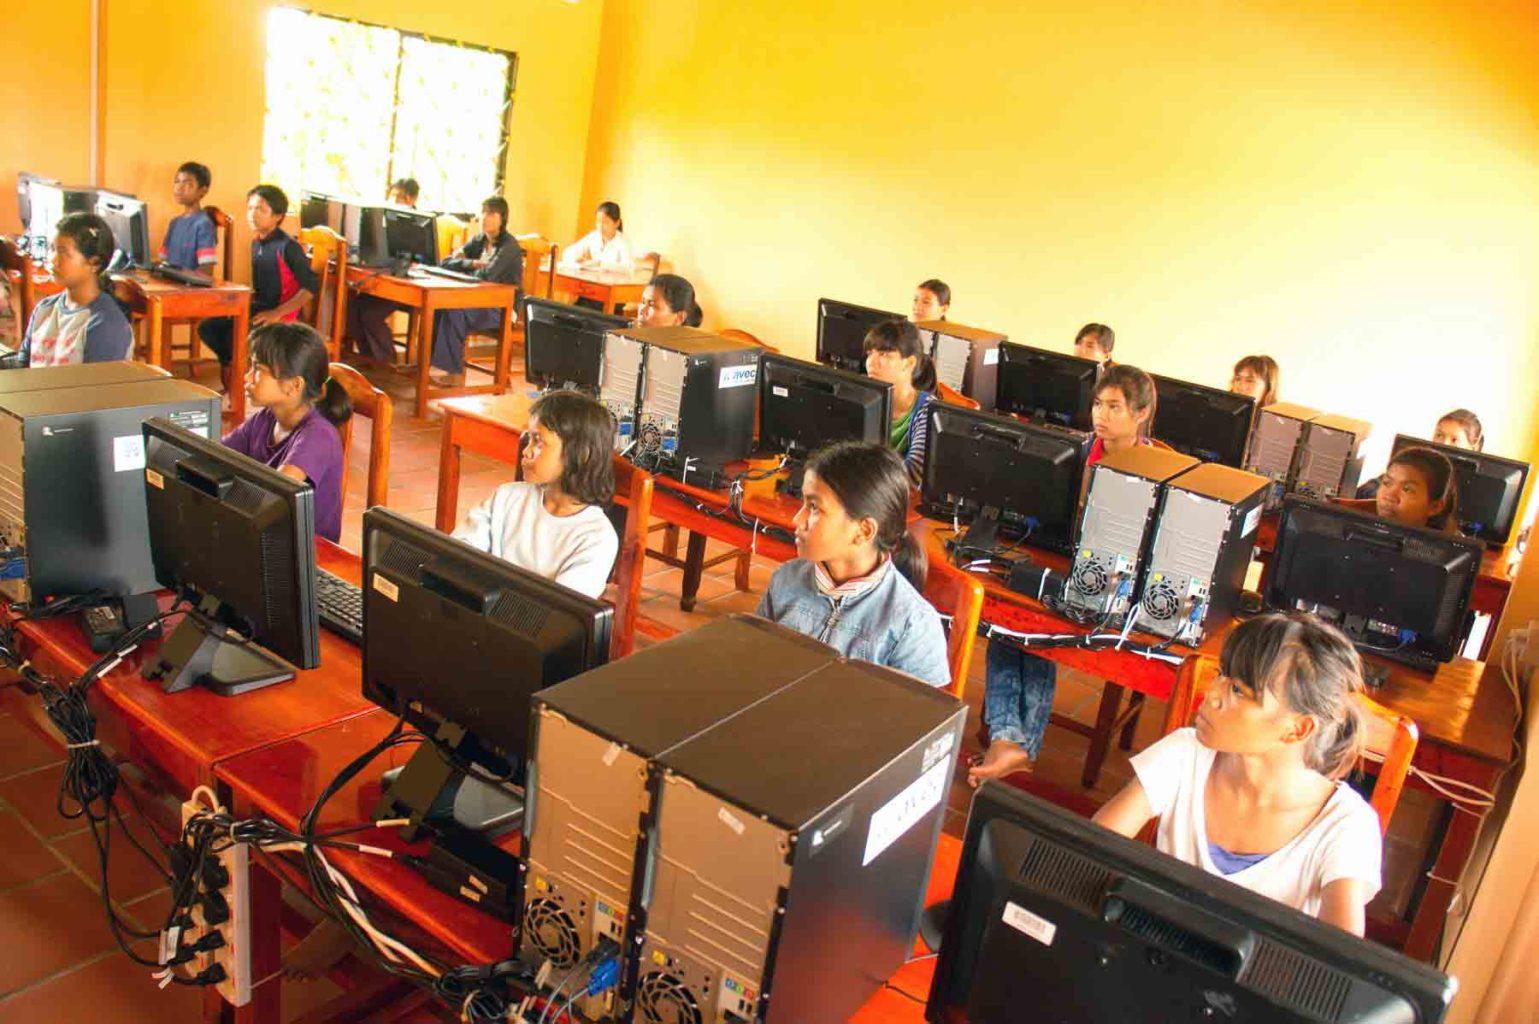 Computer Training Center in Cambodia